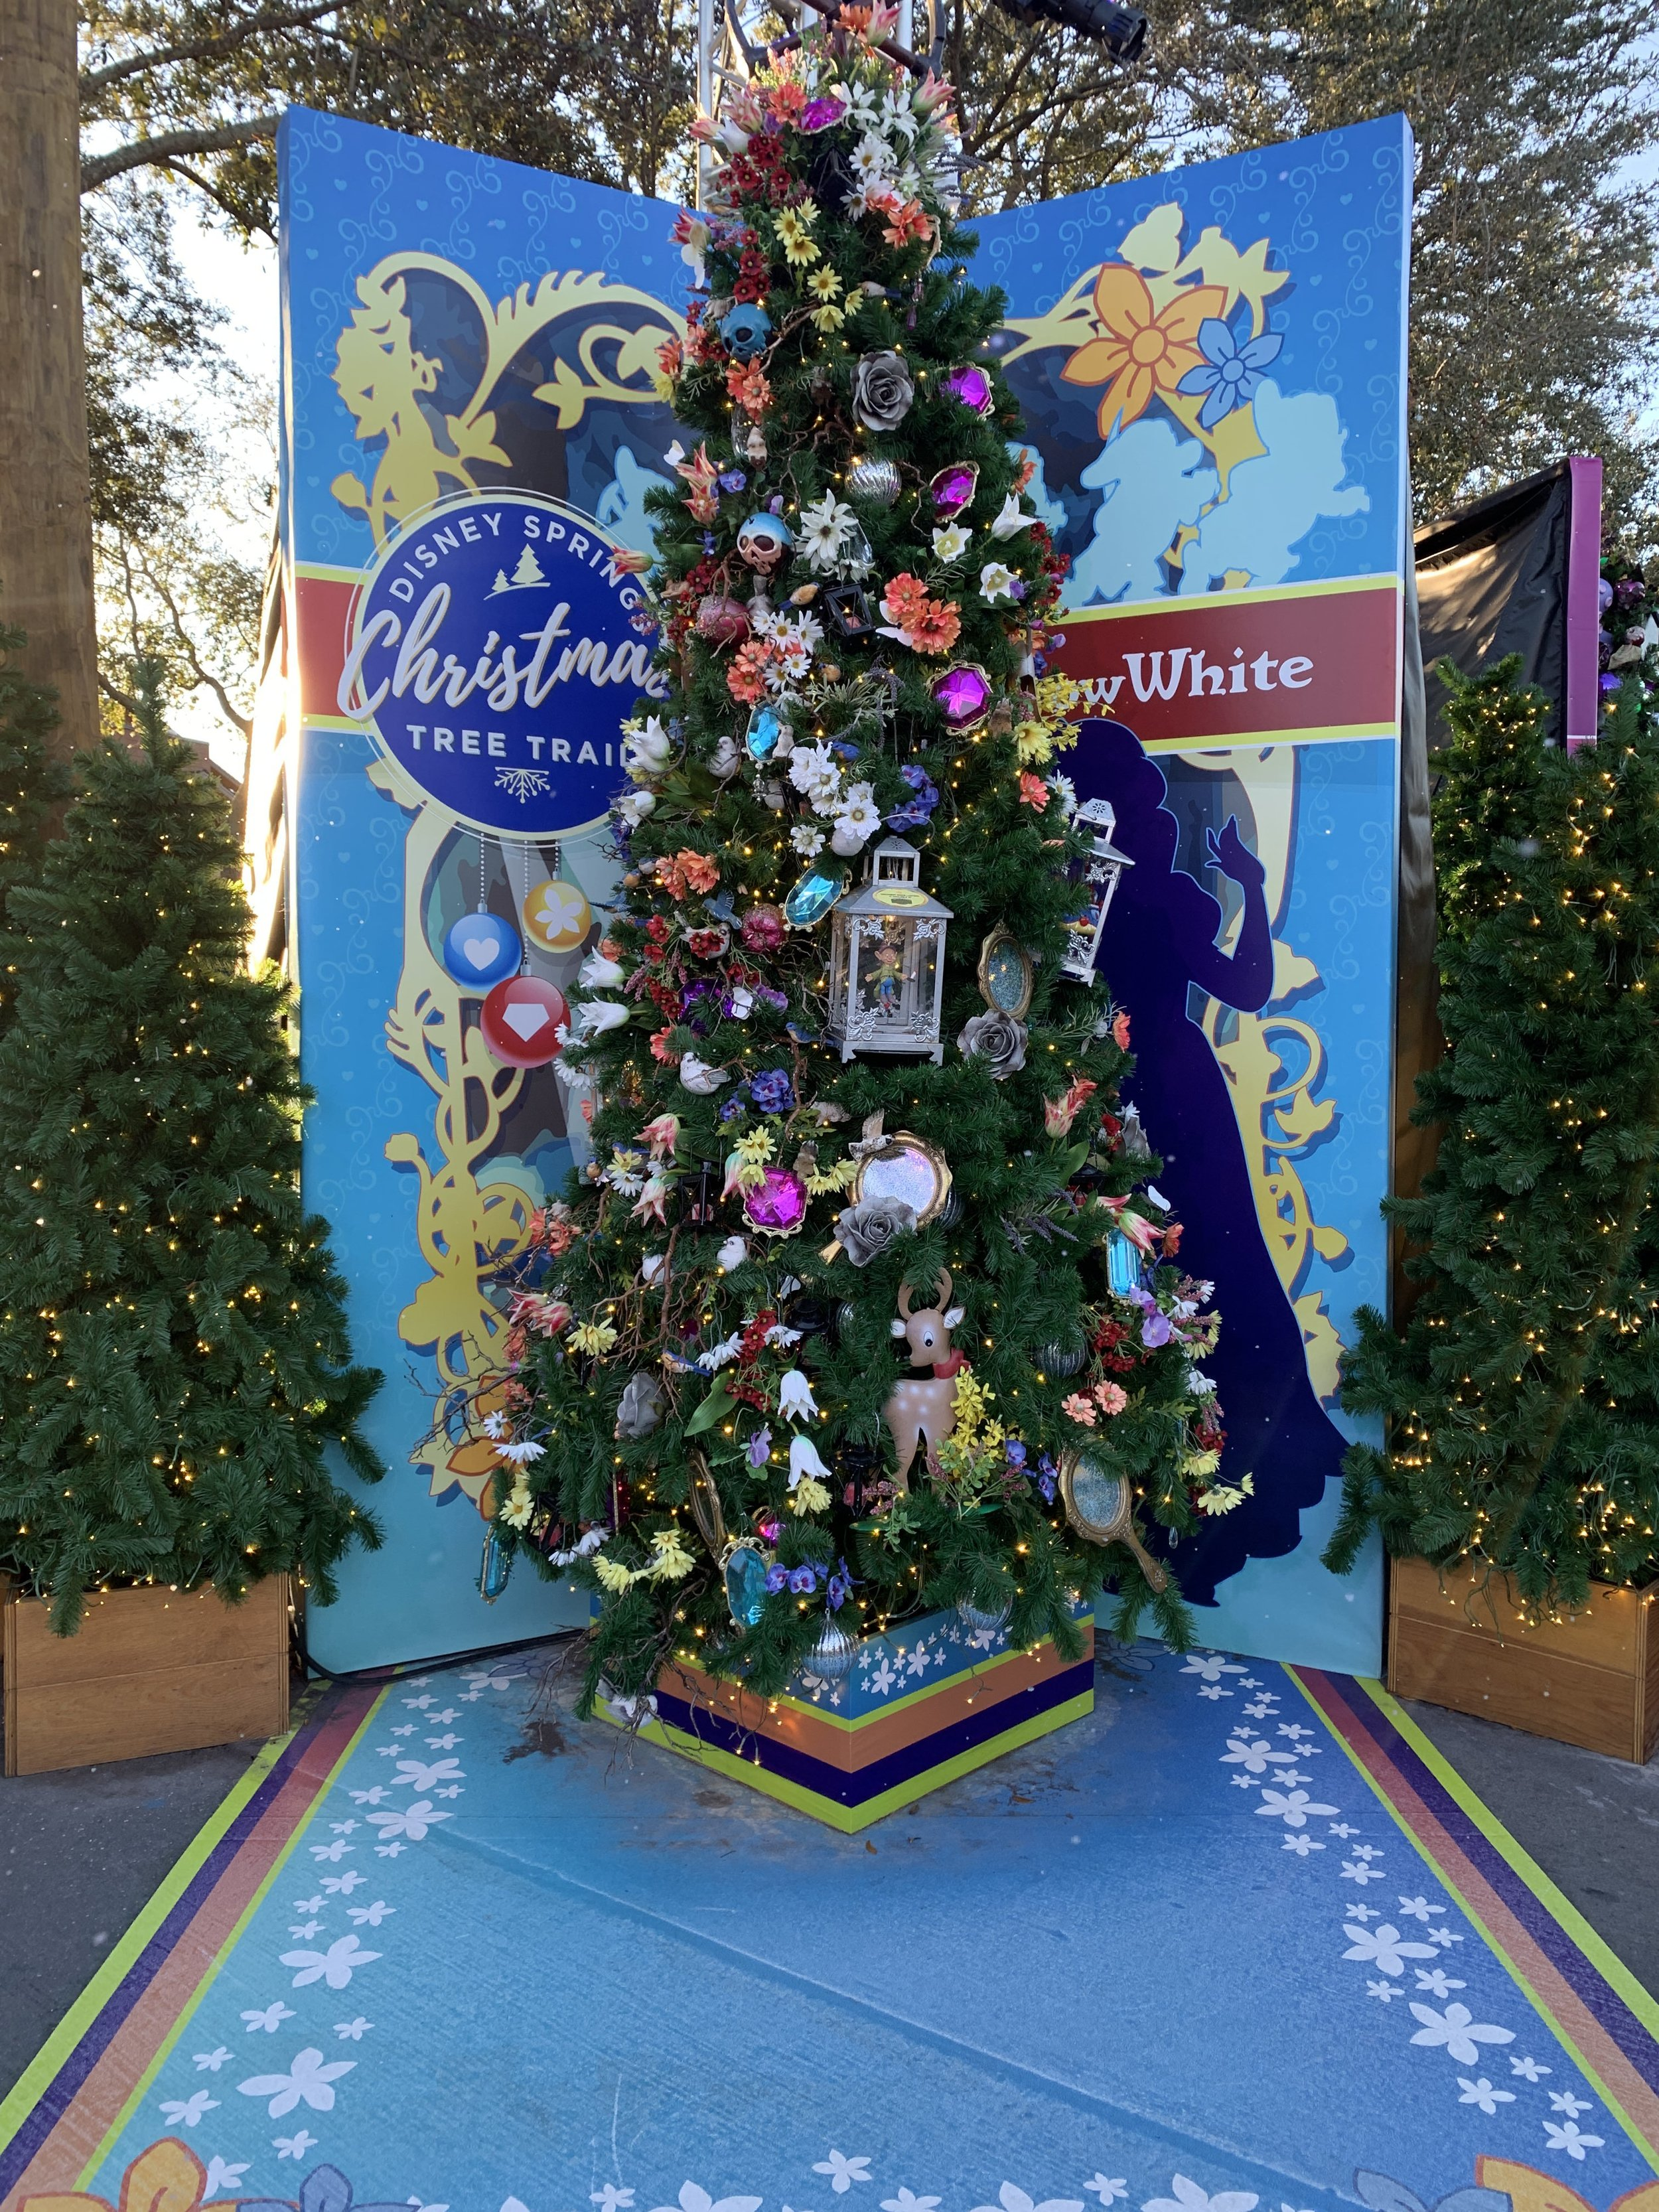 Snow White's tree